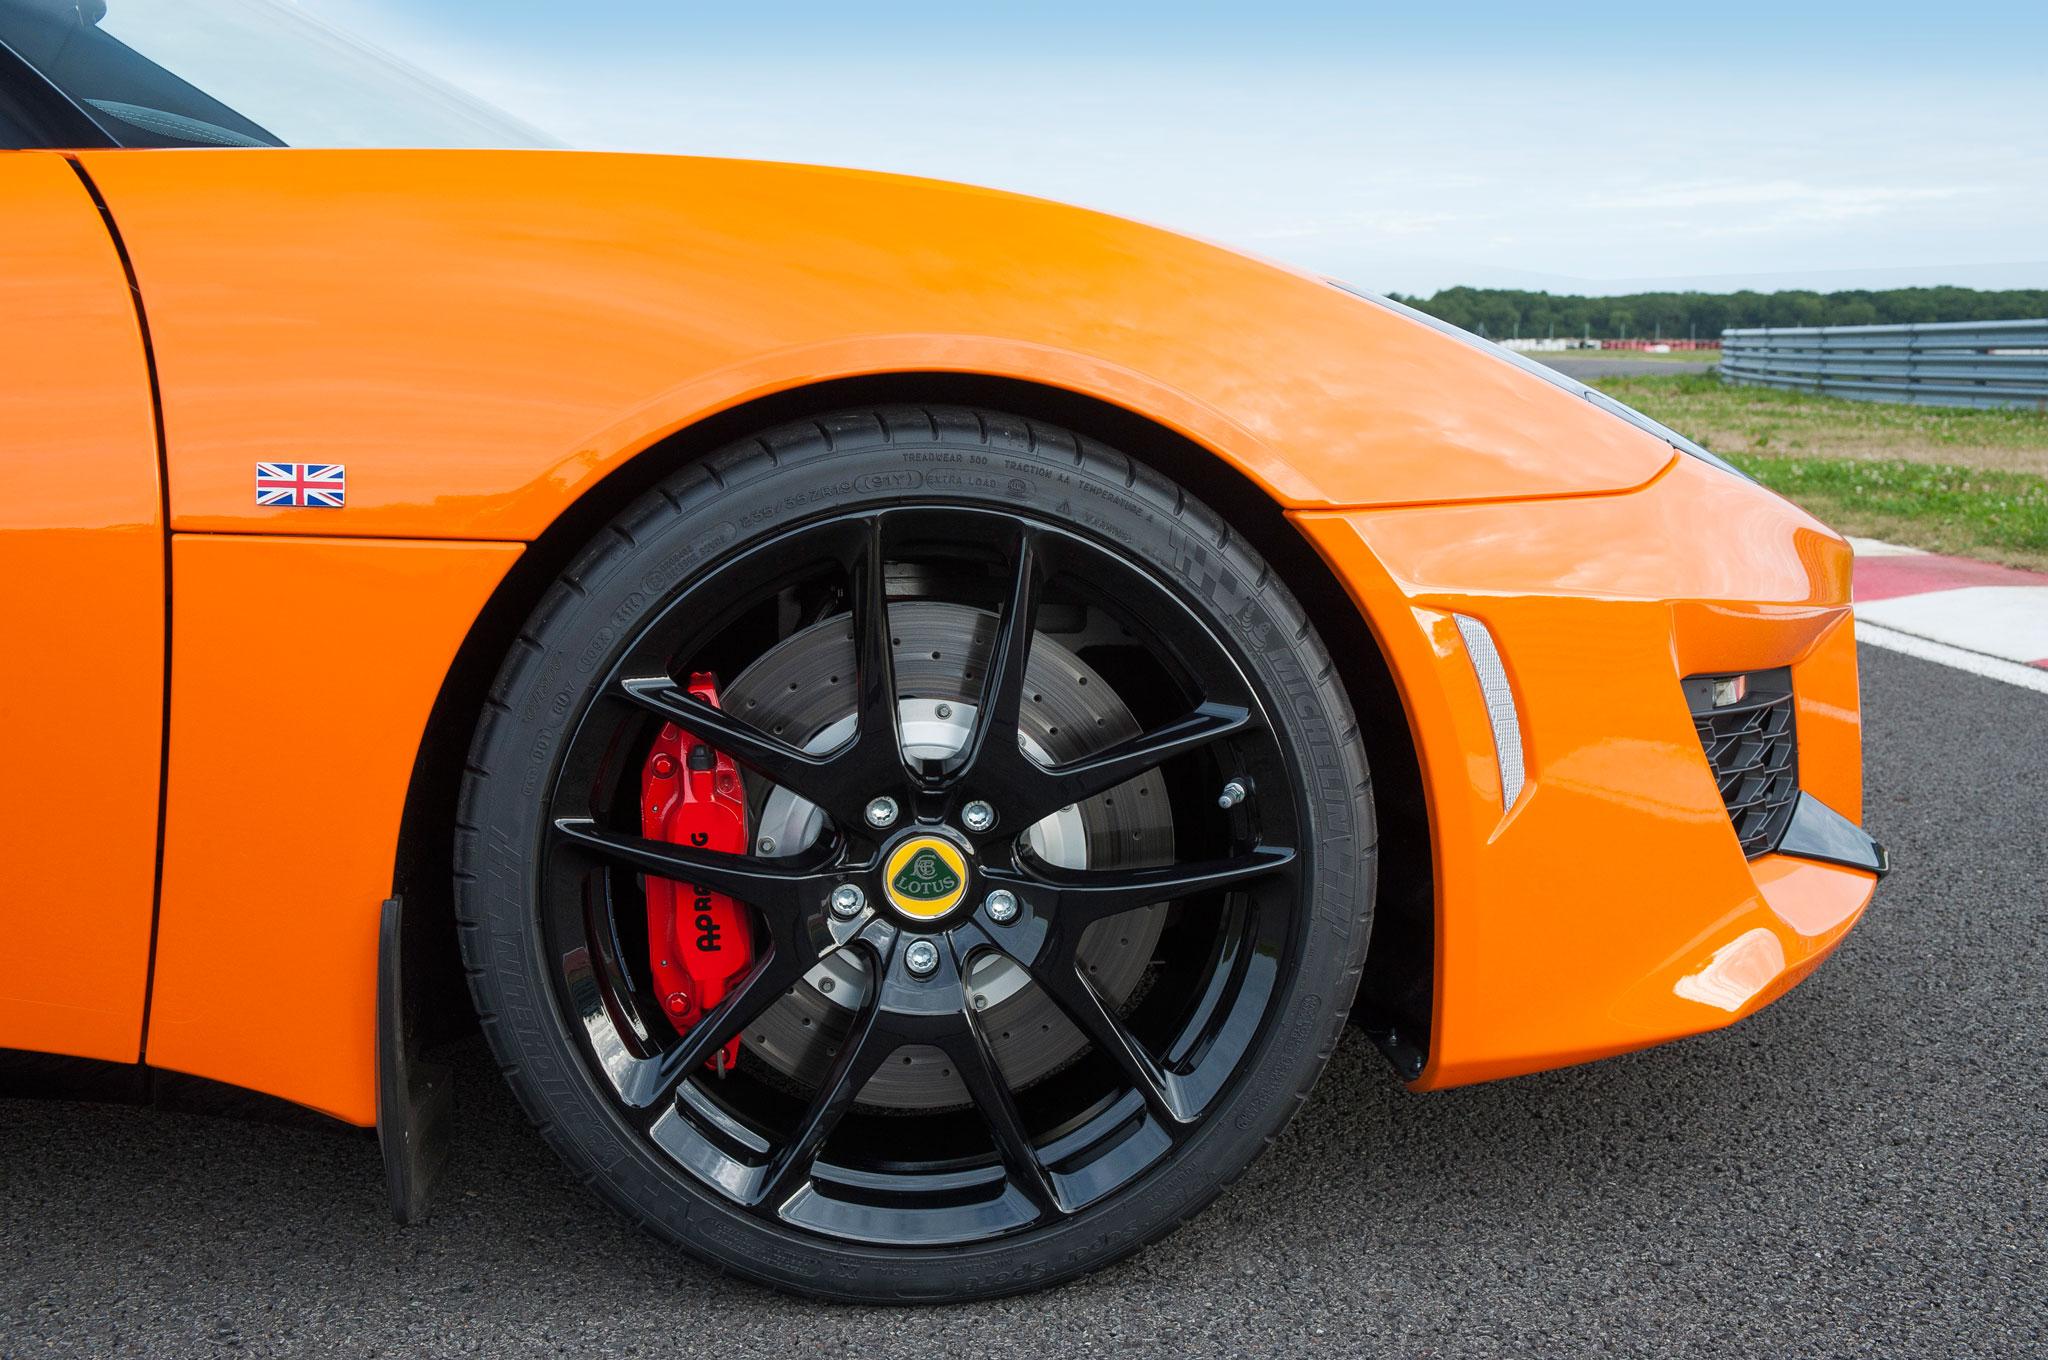 http://st.automobilemag.com/uploads/sites/11/2015/08/2016-Lotus-Evora-400-wheel.jpg